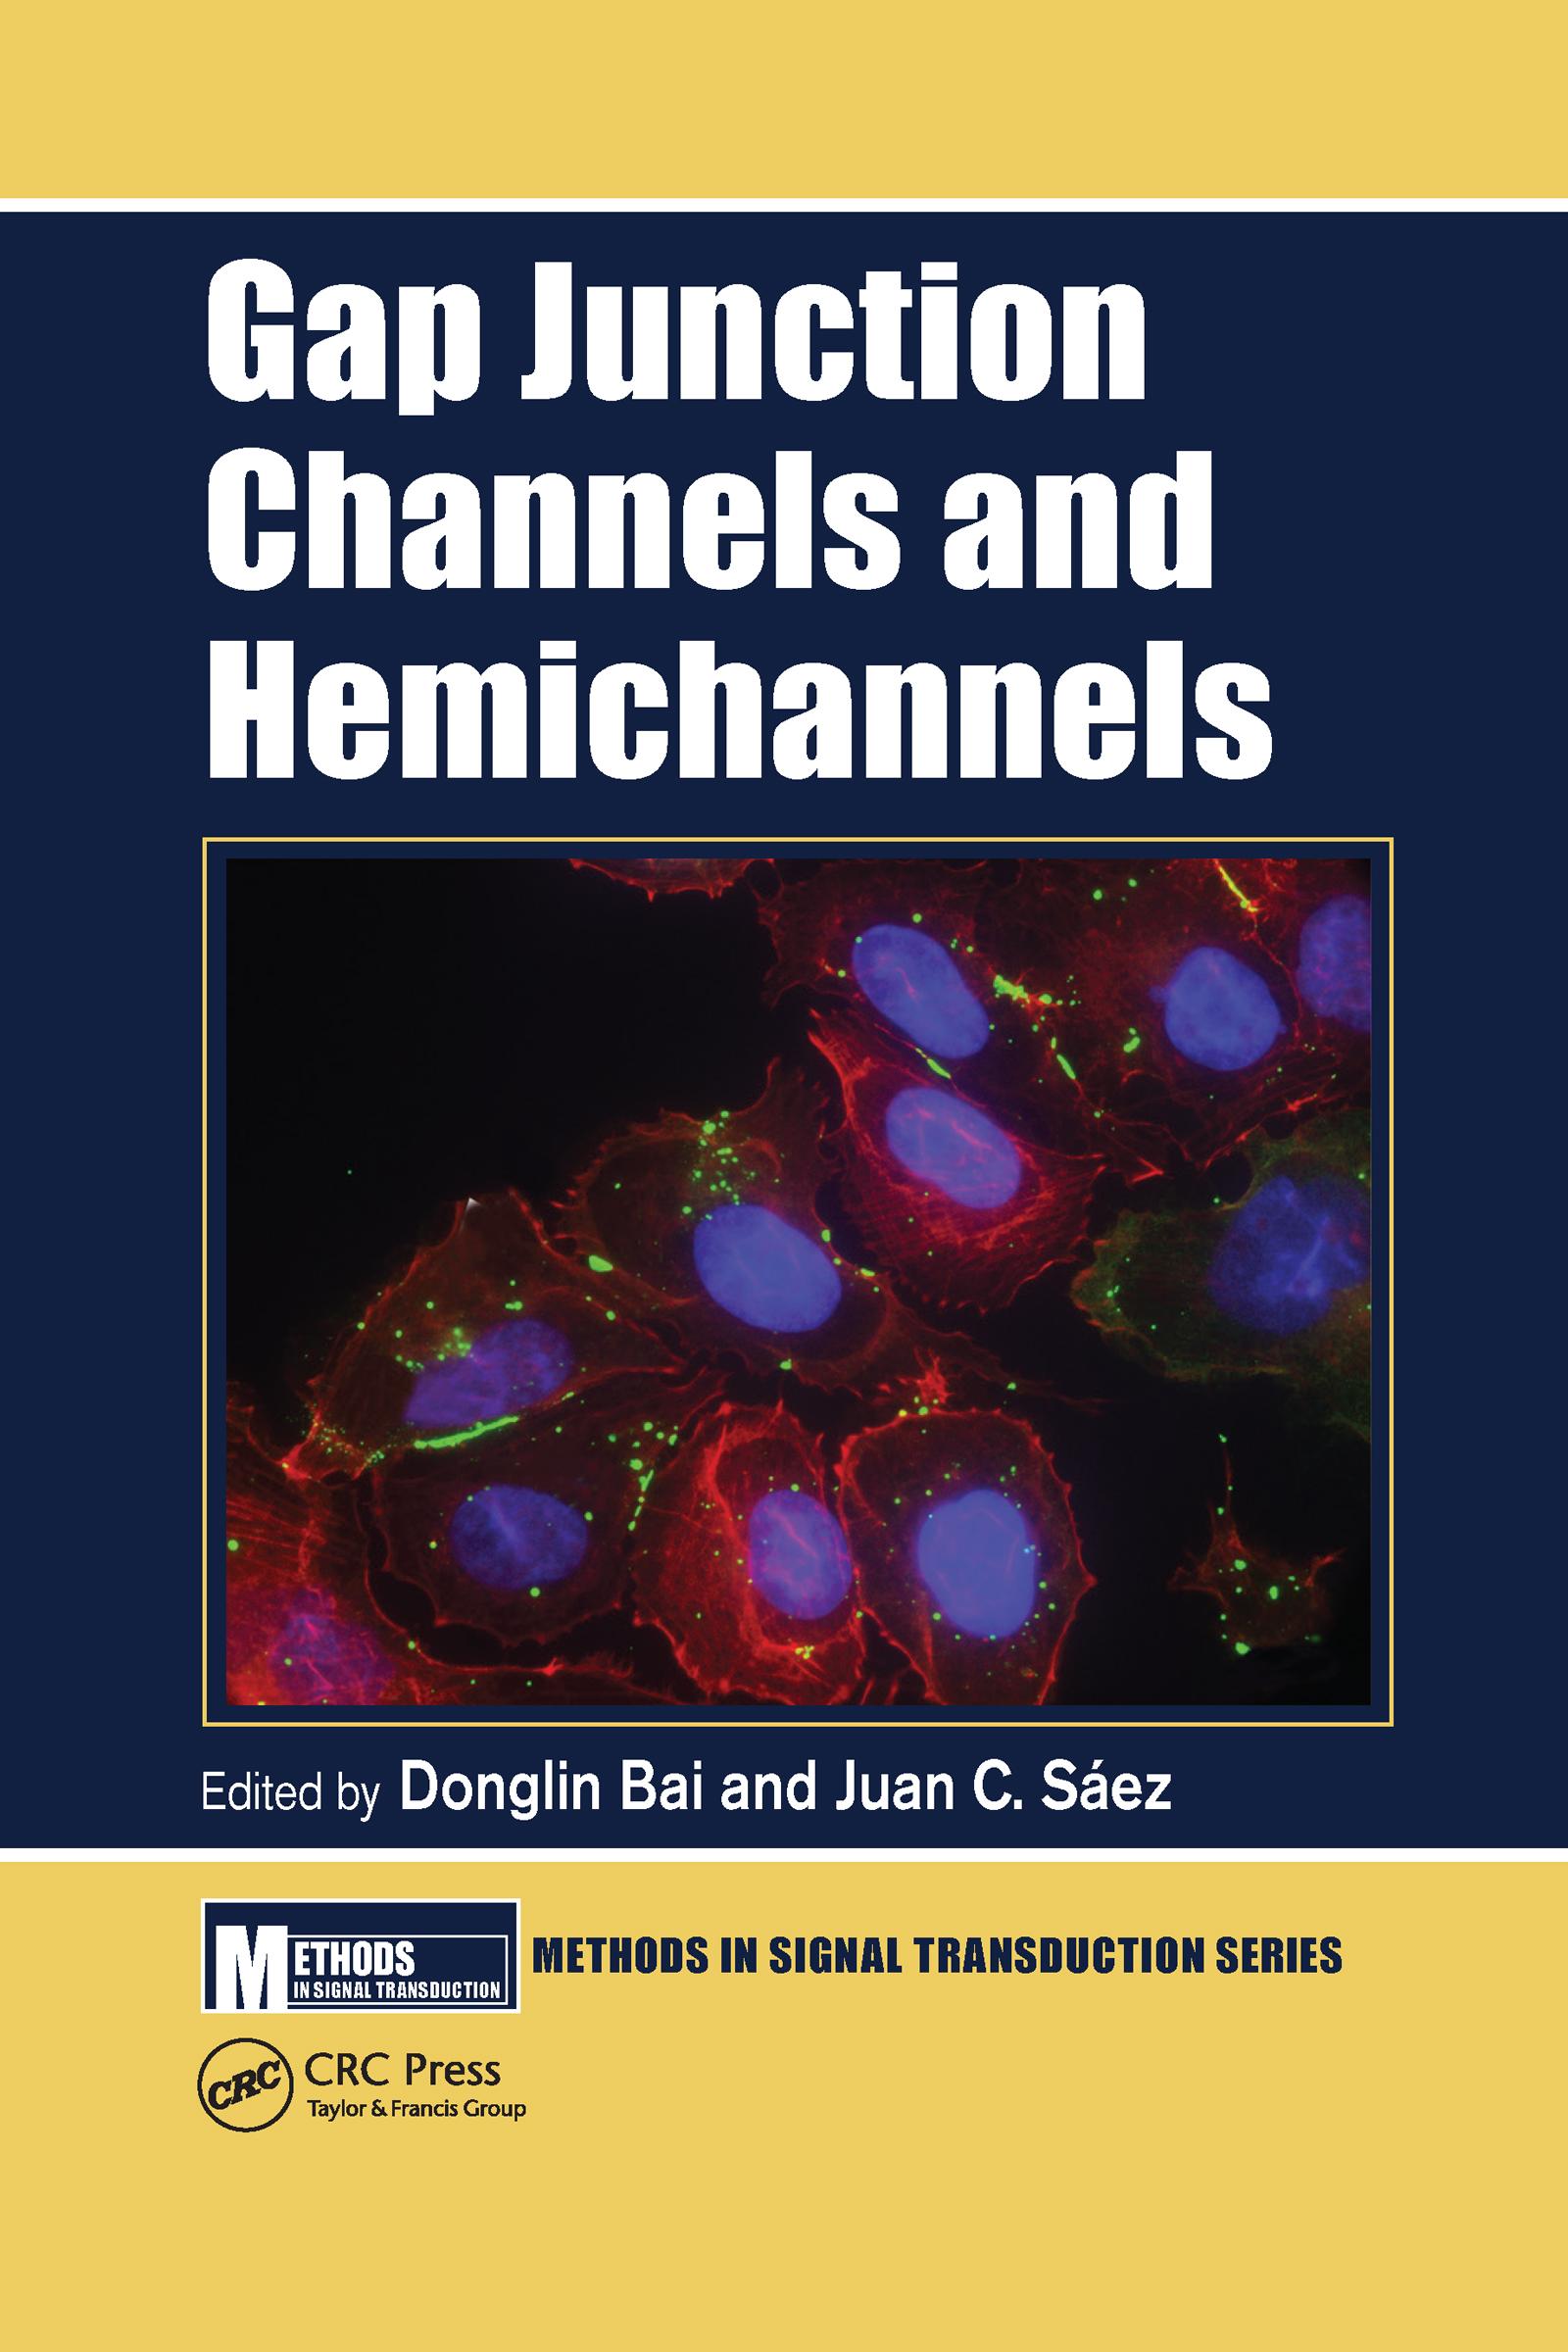 Gap Junction Channels and Hemichannels